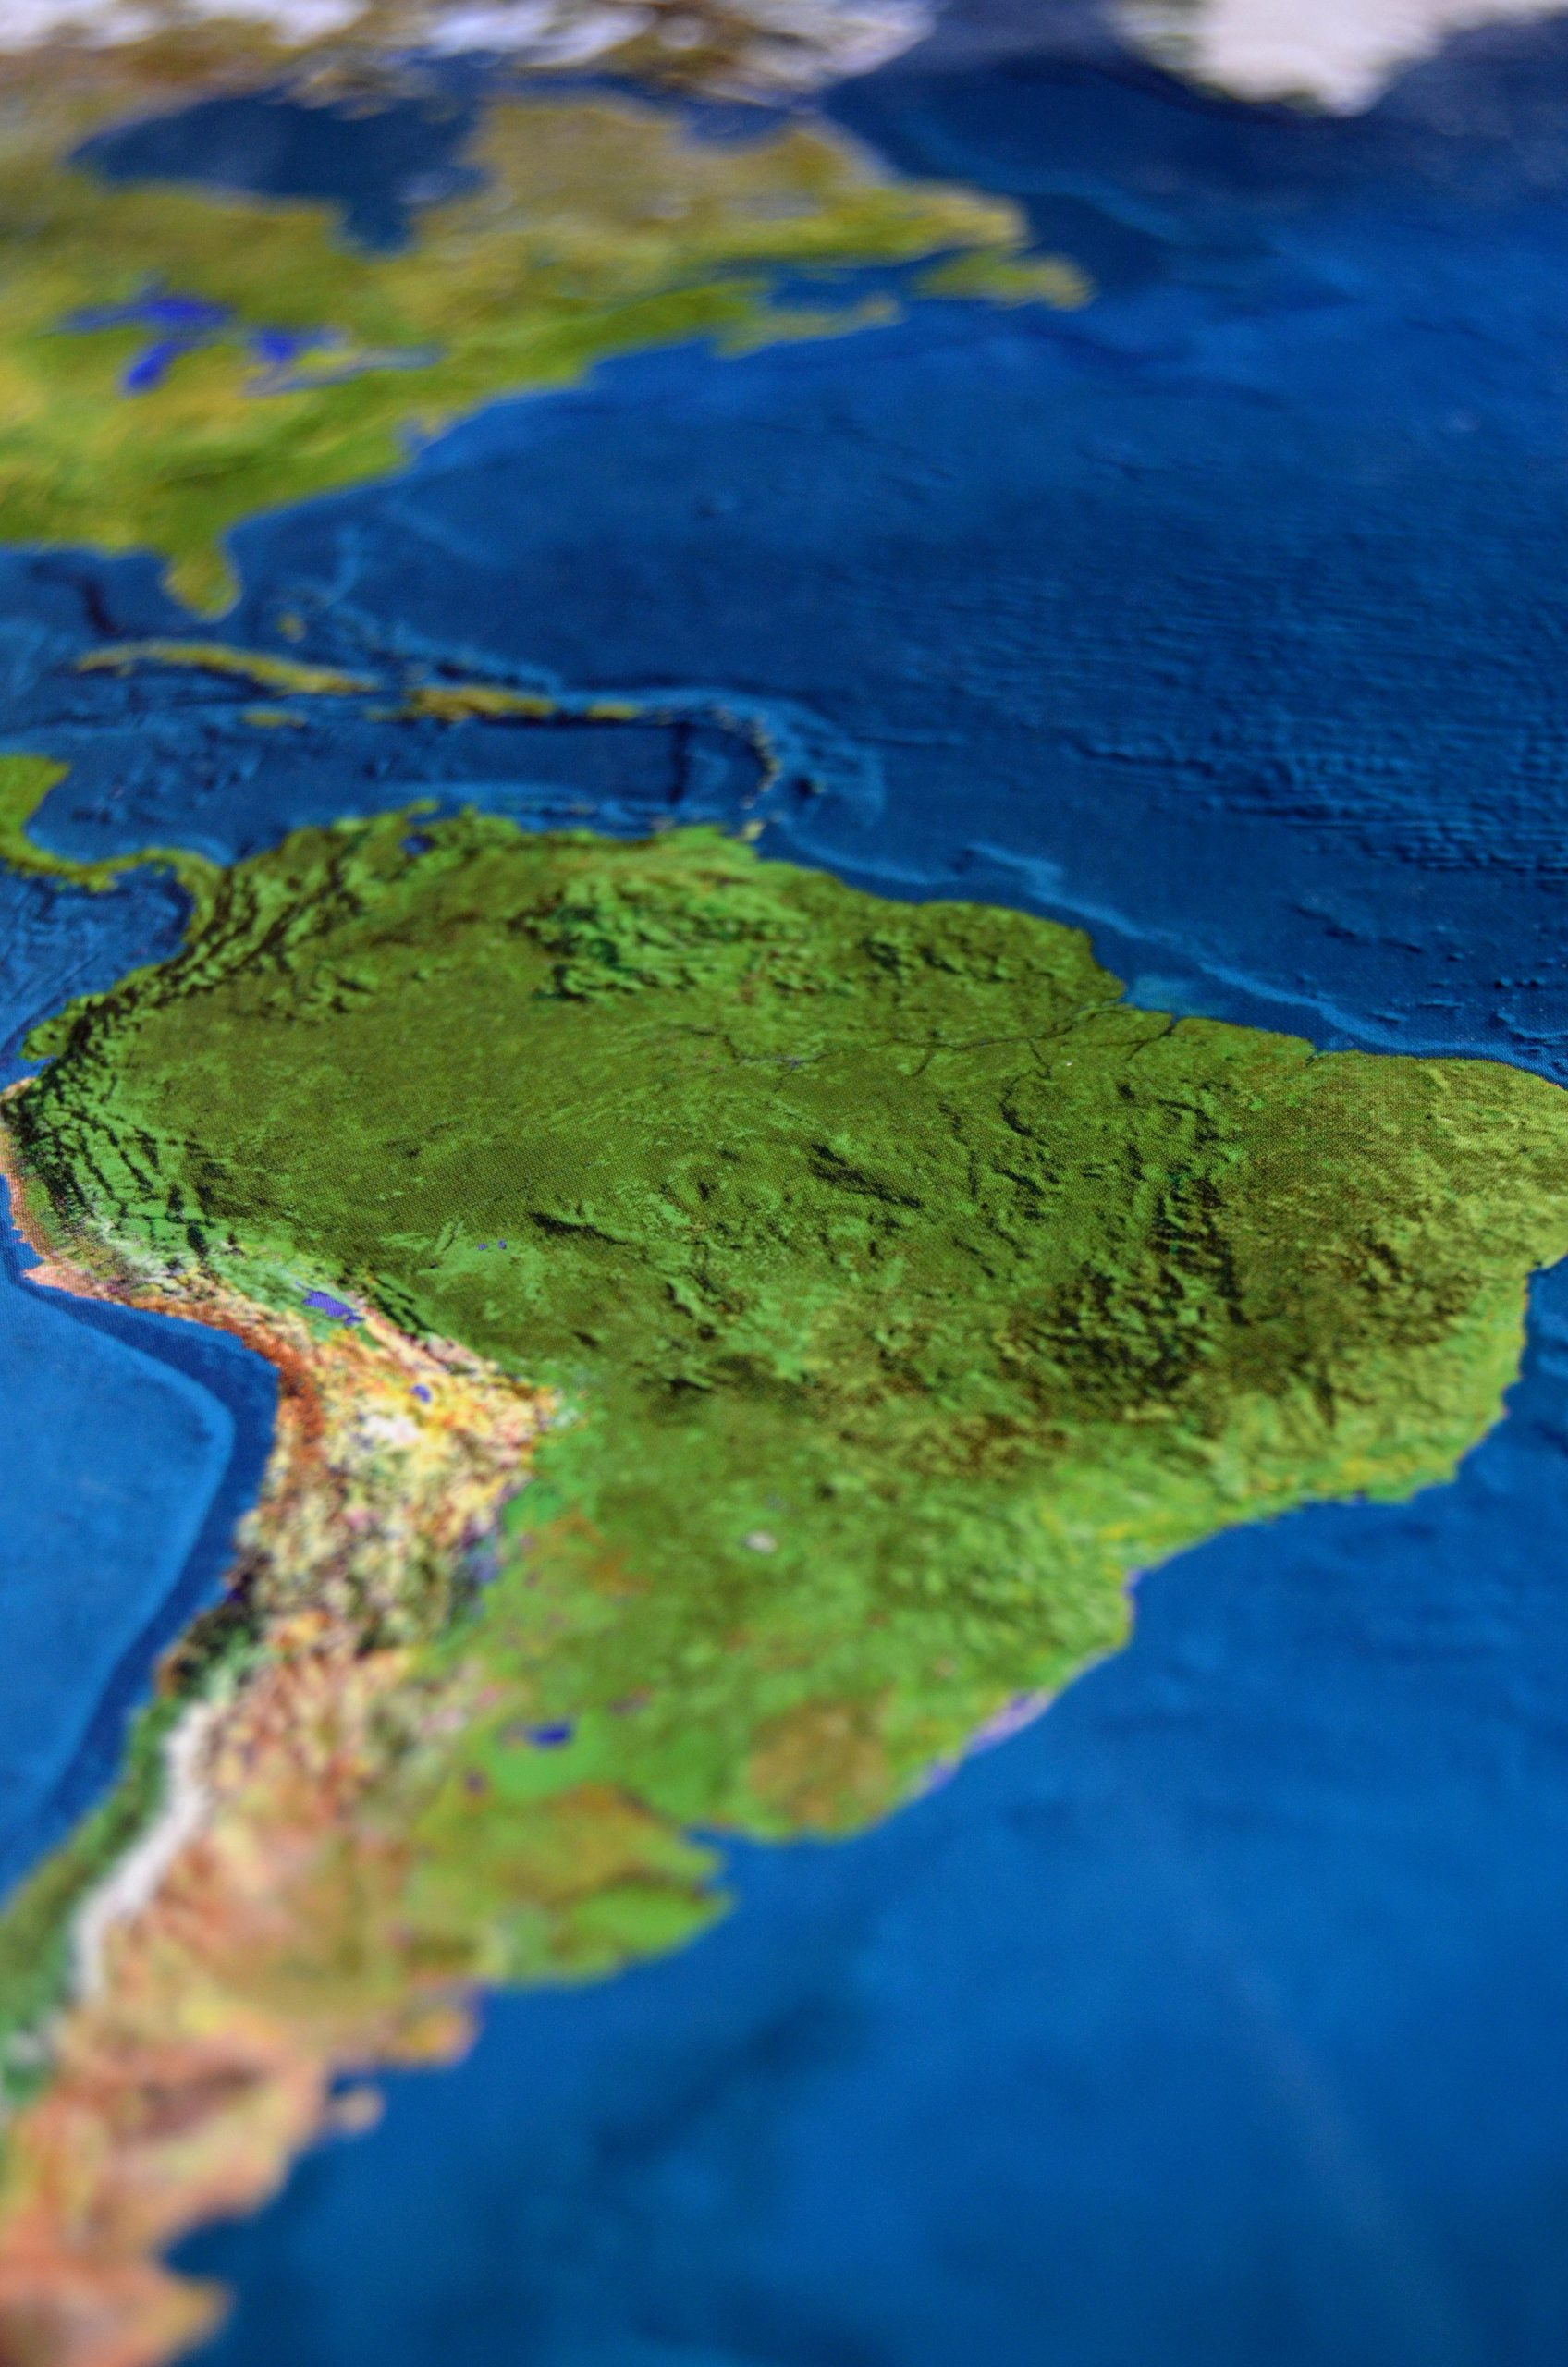 Envíos internacionales a latinoamérica